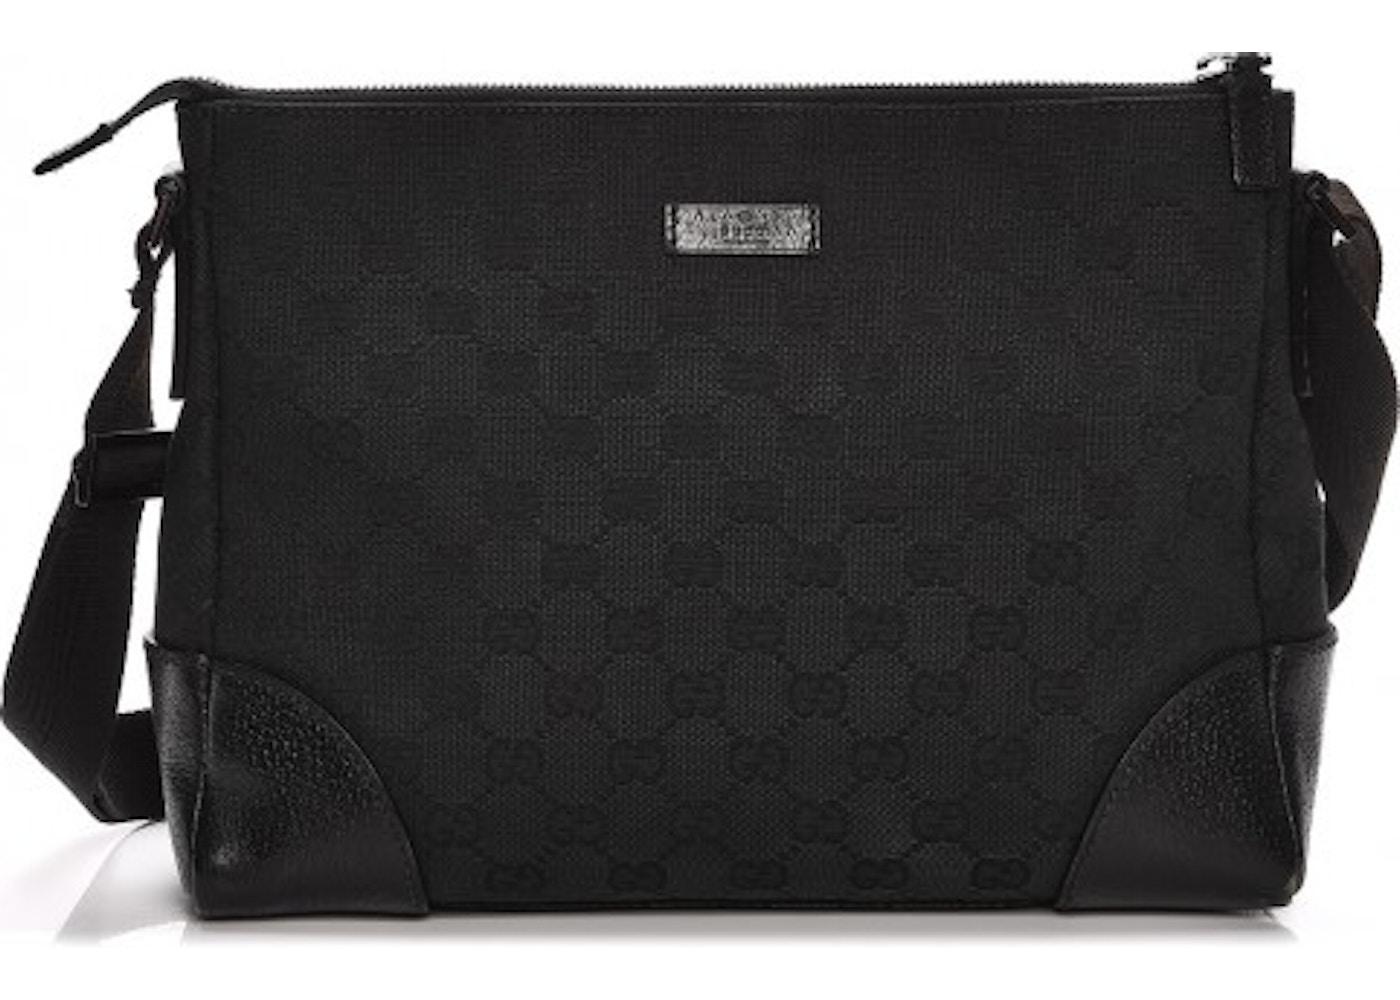 5b673b722 Gucci Messenger Shoulder Bag Monogram GG Black. Monogram GG Black